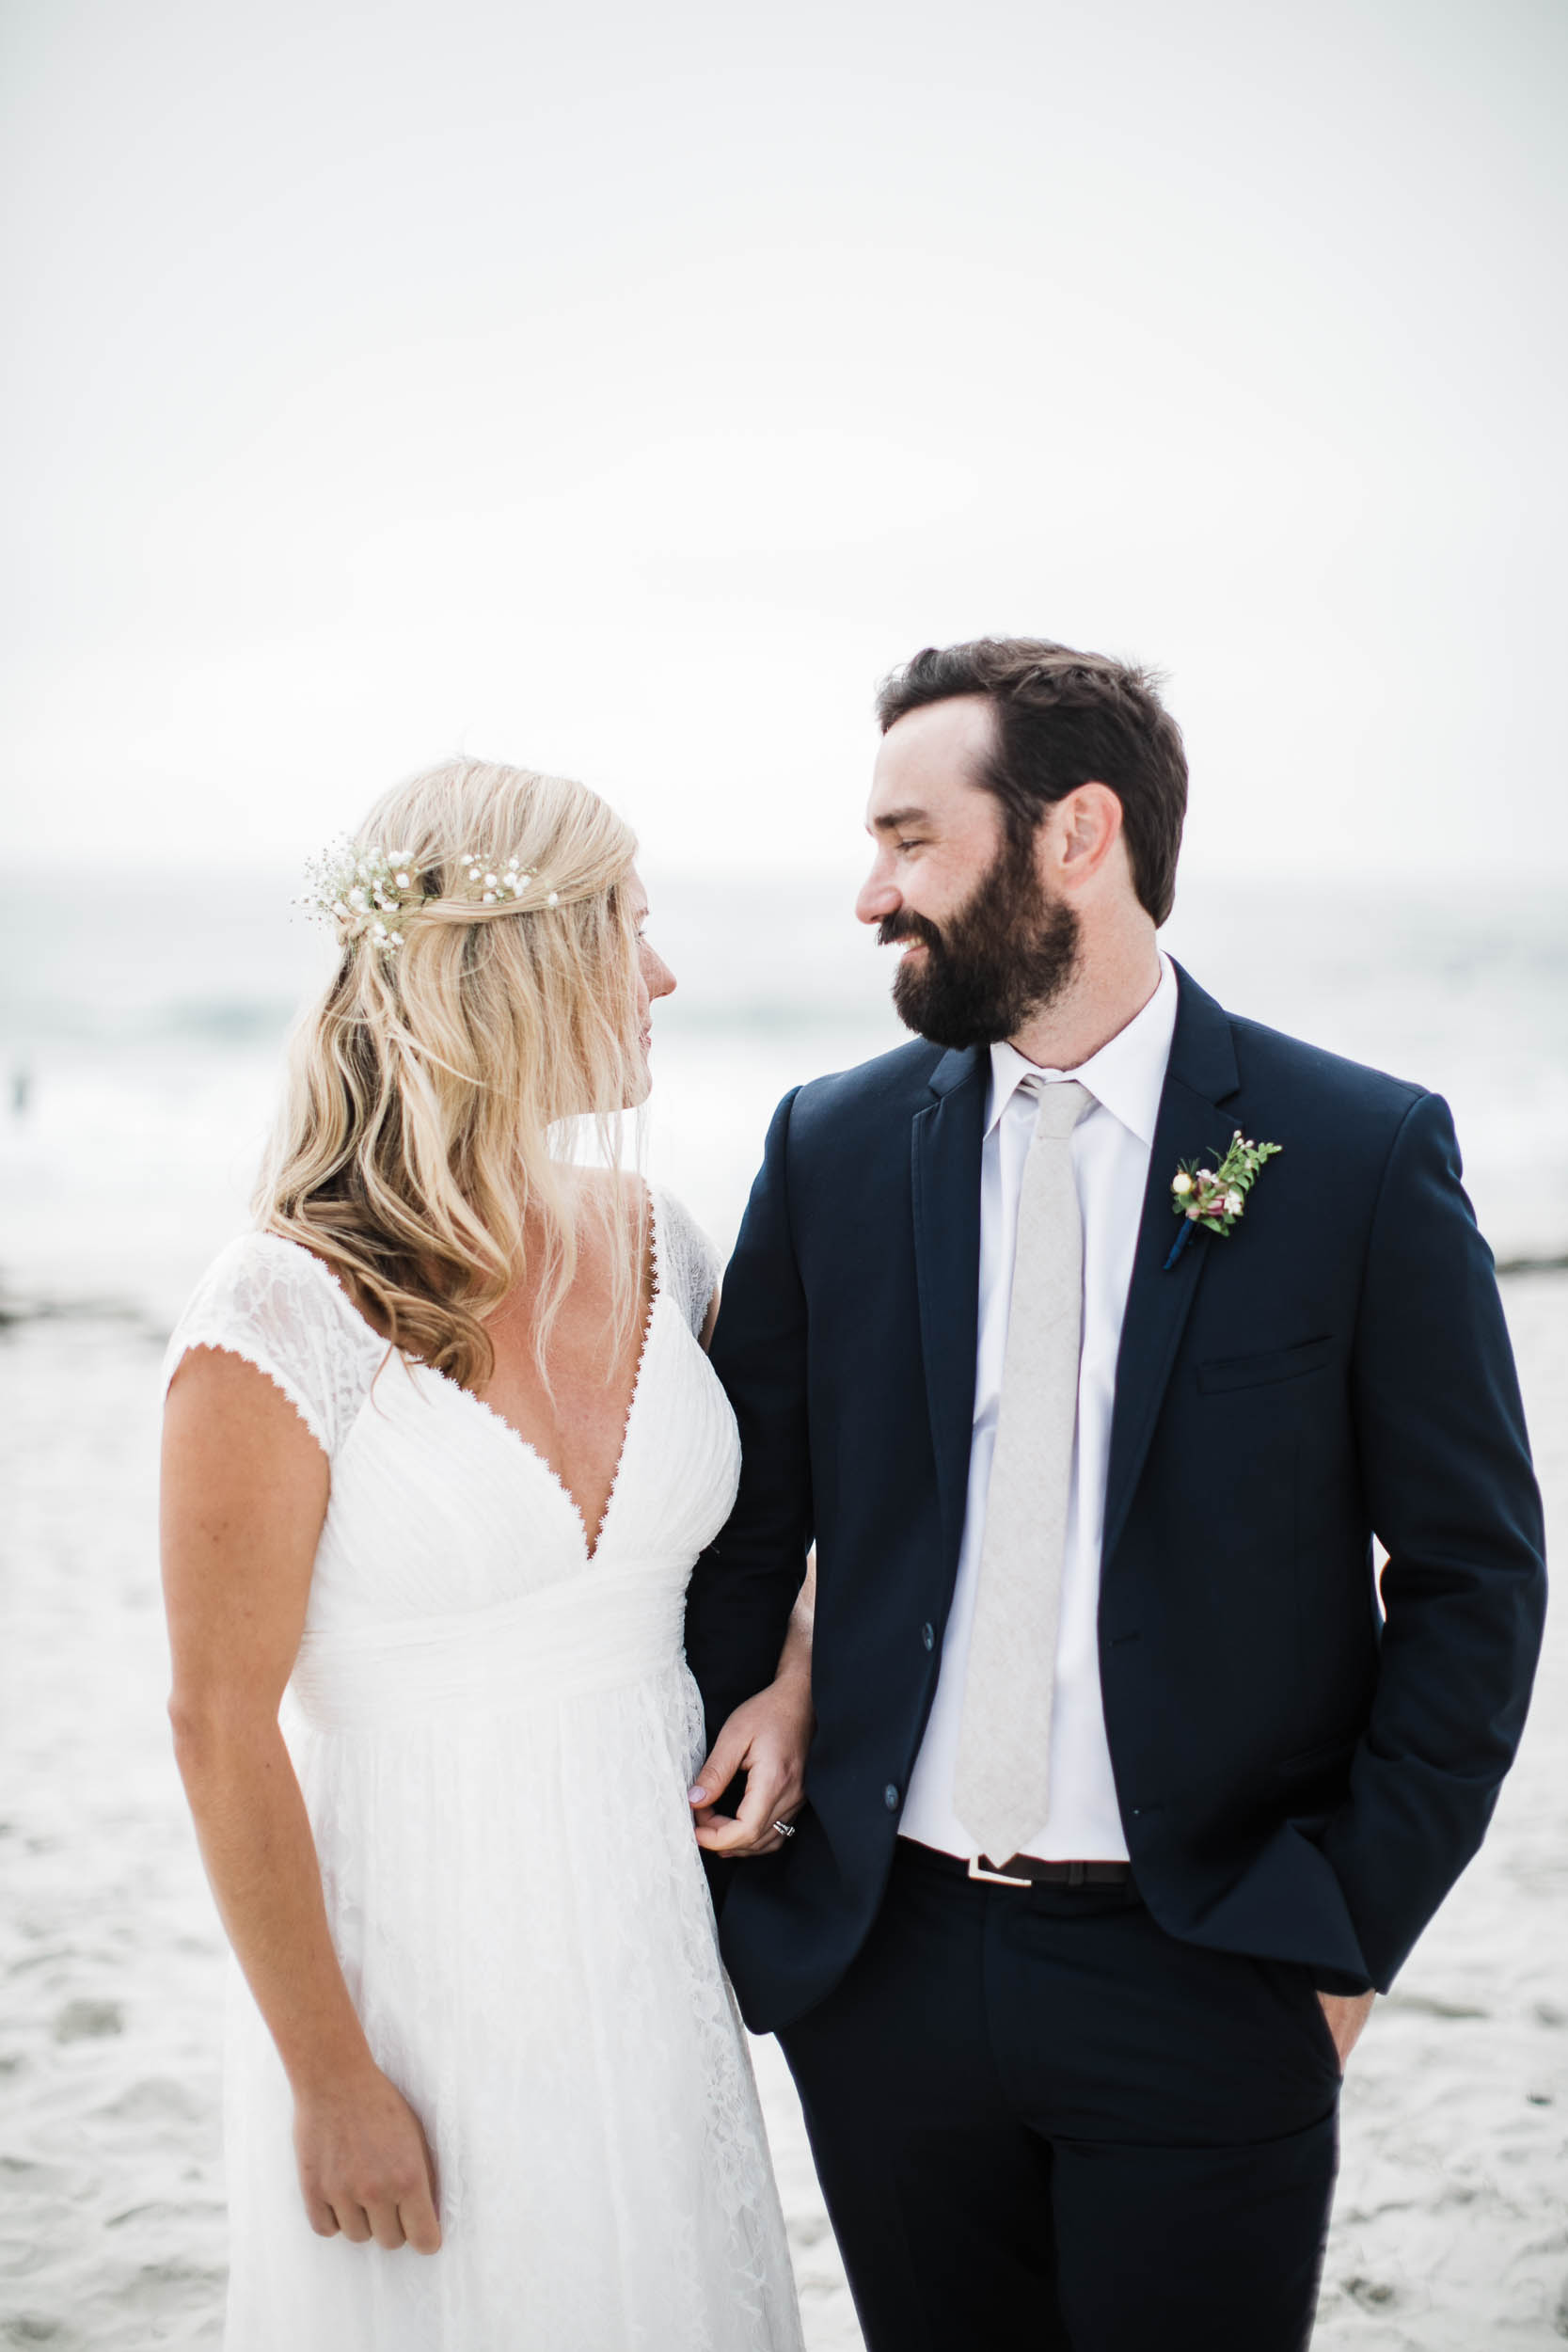 082617_C+K_Asilomar Pacific Grove Wedding_Buena Lane Photography_2708ER.jpg